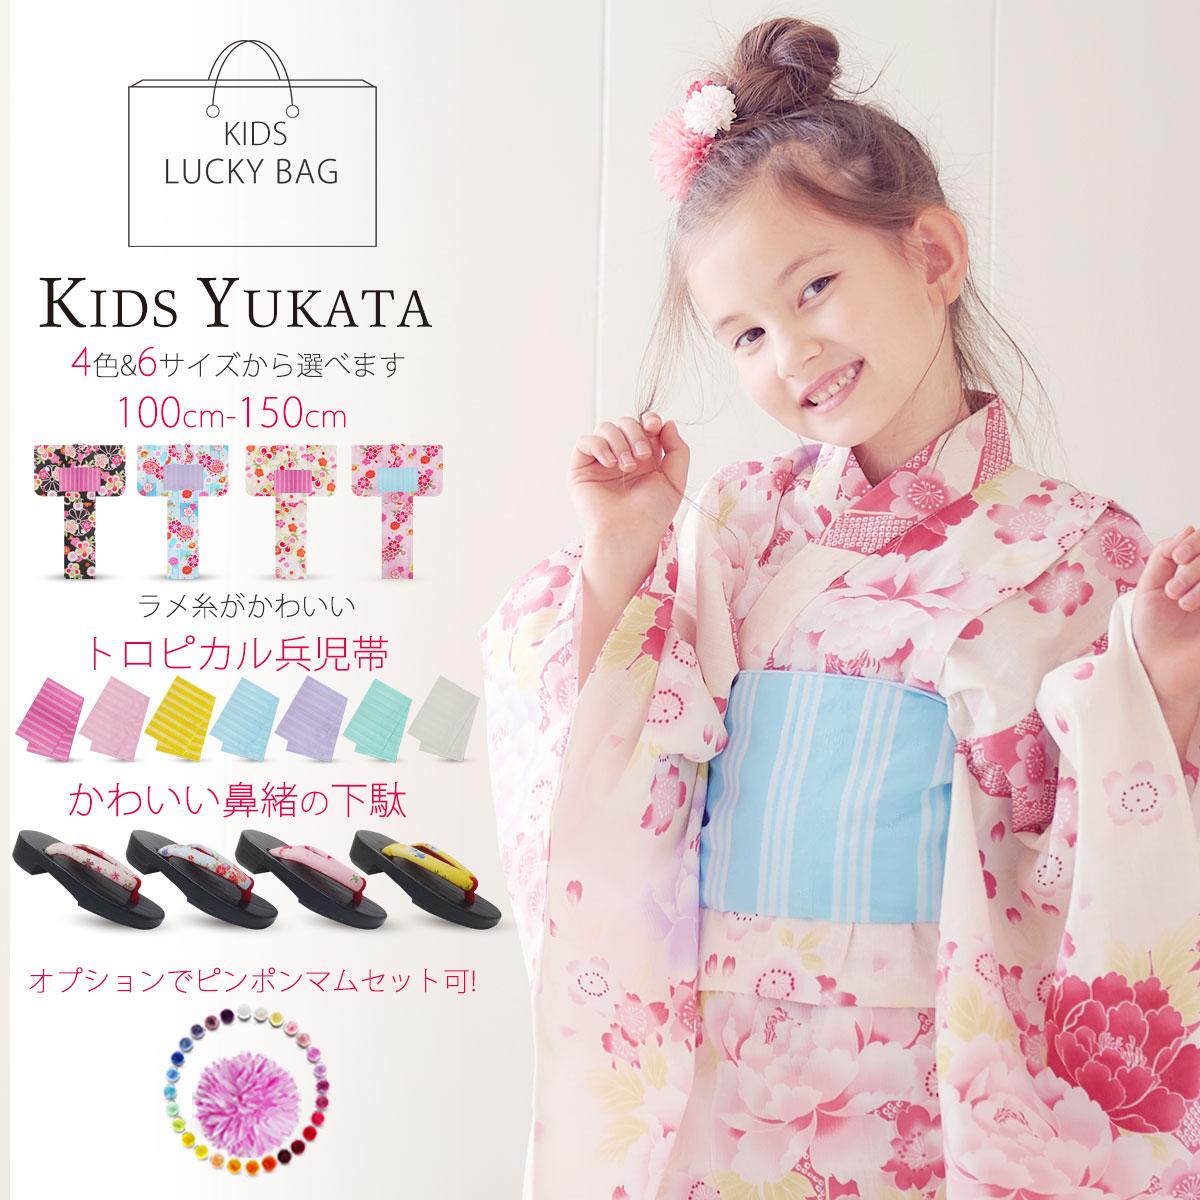 6c1edb554554d 楽天市場 「京都きものcafe kids」子供浴衣3点セット 4色 6サイズ 完全 ...